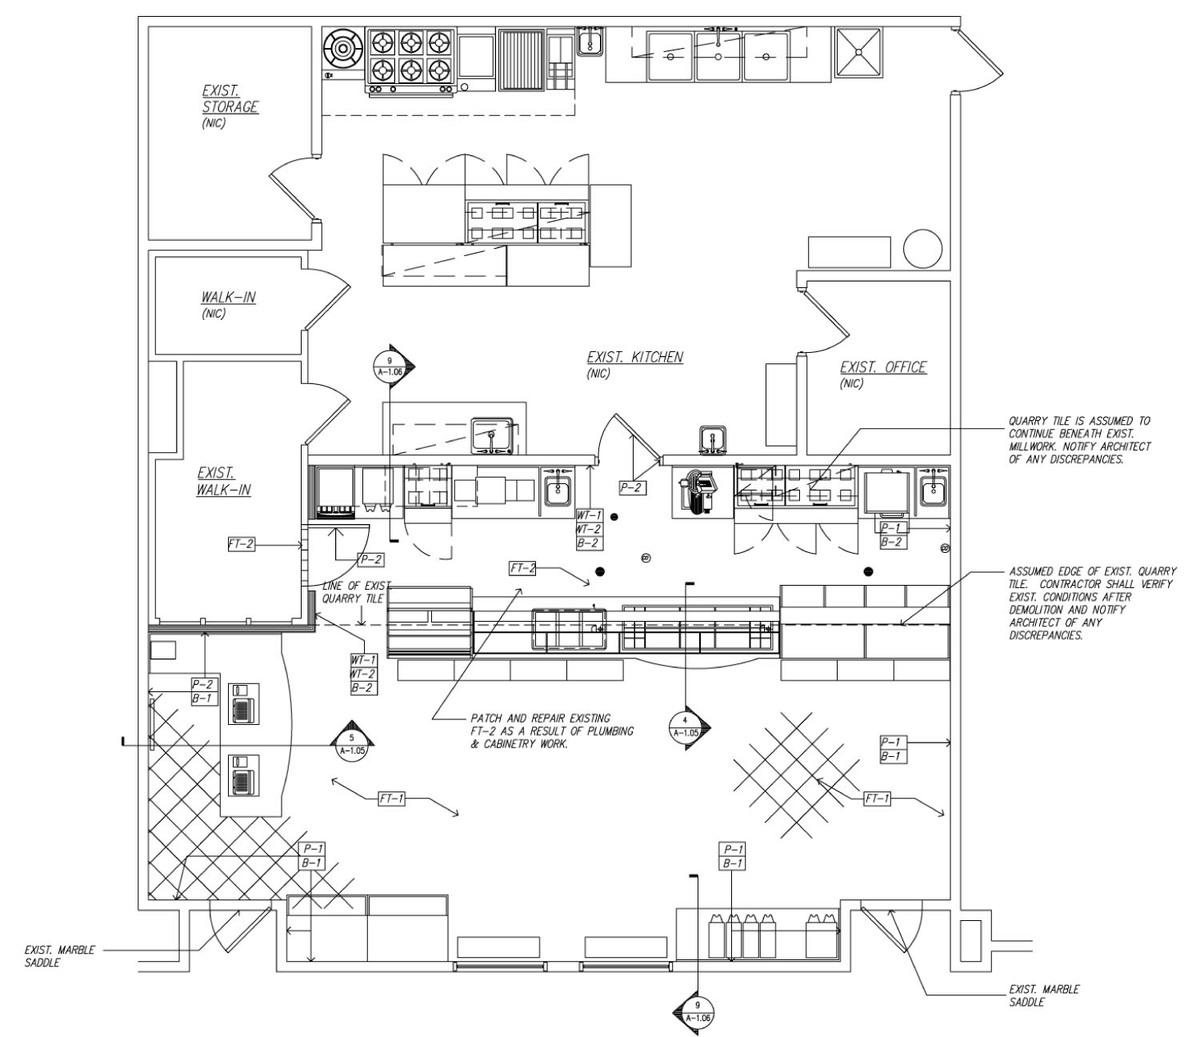 Simple Restaurant Kitchen Layout simple restaurant kitchen layout